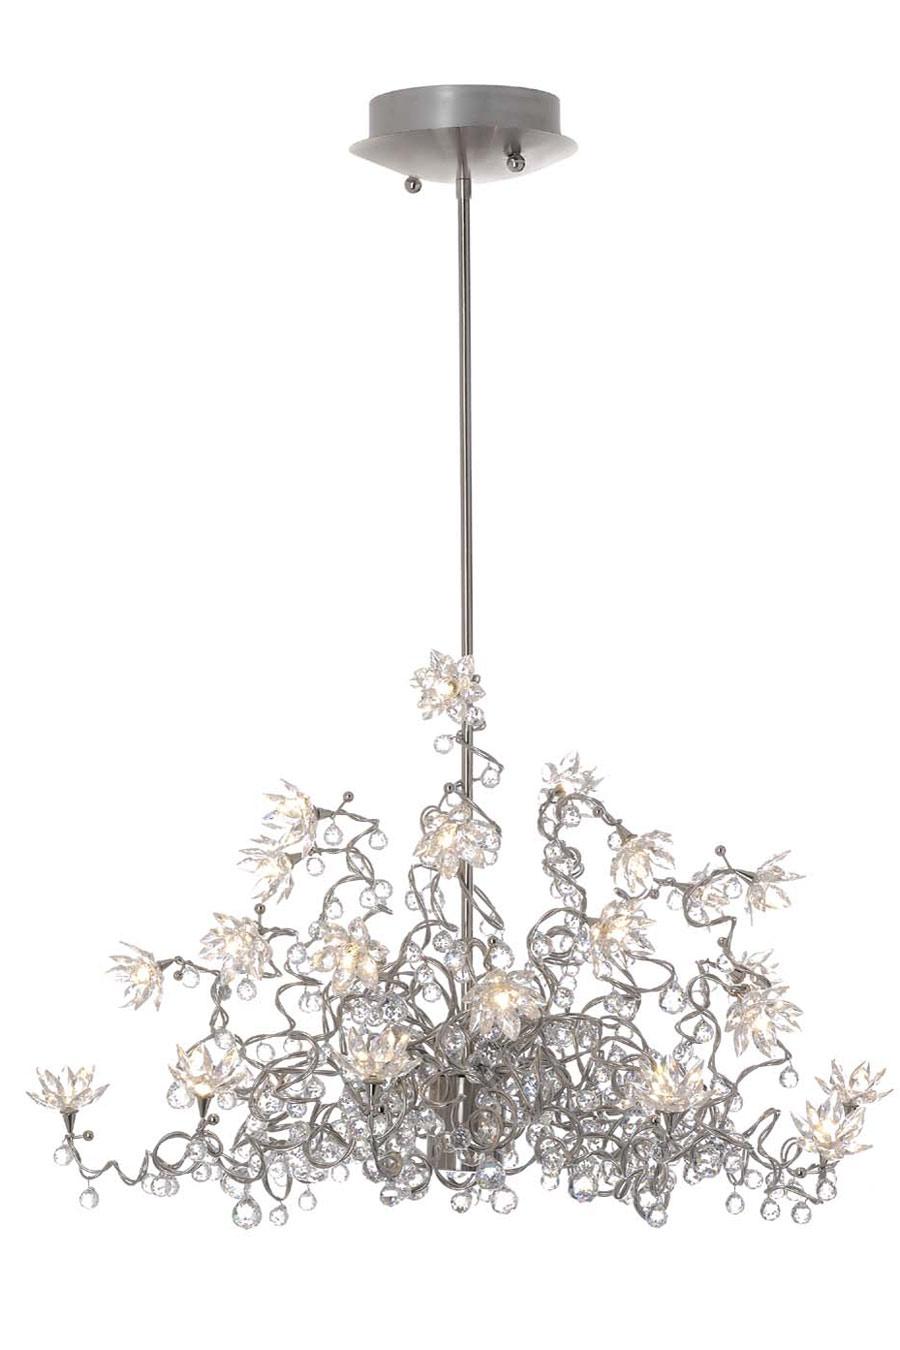 Jewel diamond chandelier clear 24 light chandelier in clear glass jewel diamond chandelier clear 24 light chandelier in clear glass harco loor mozeypictures Choice Image